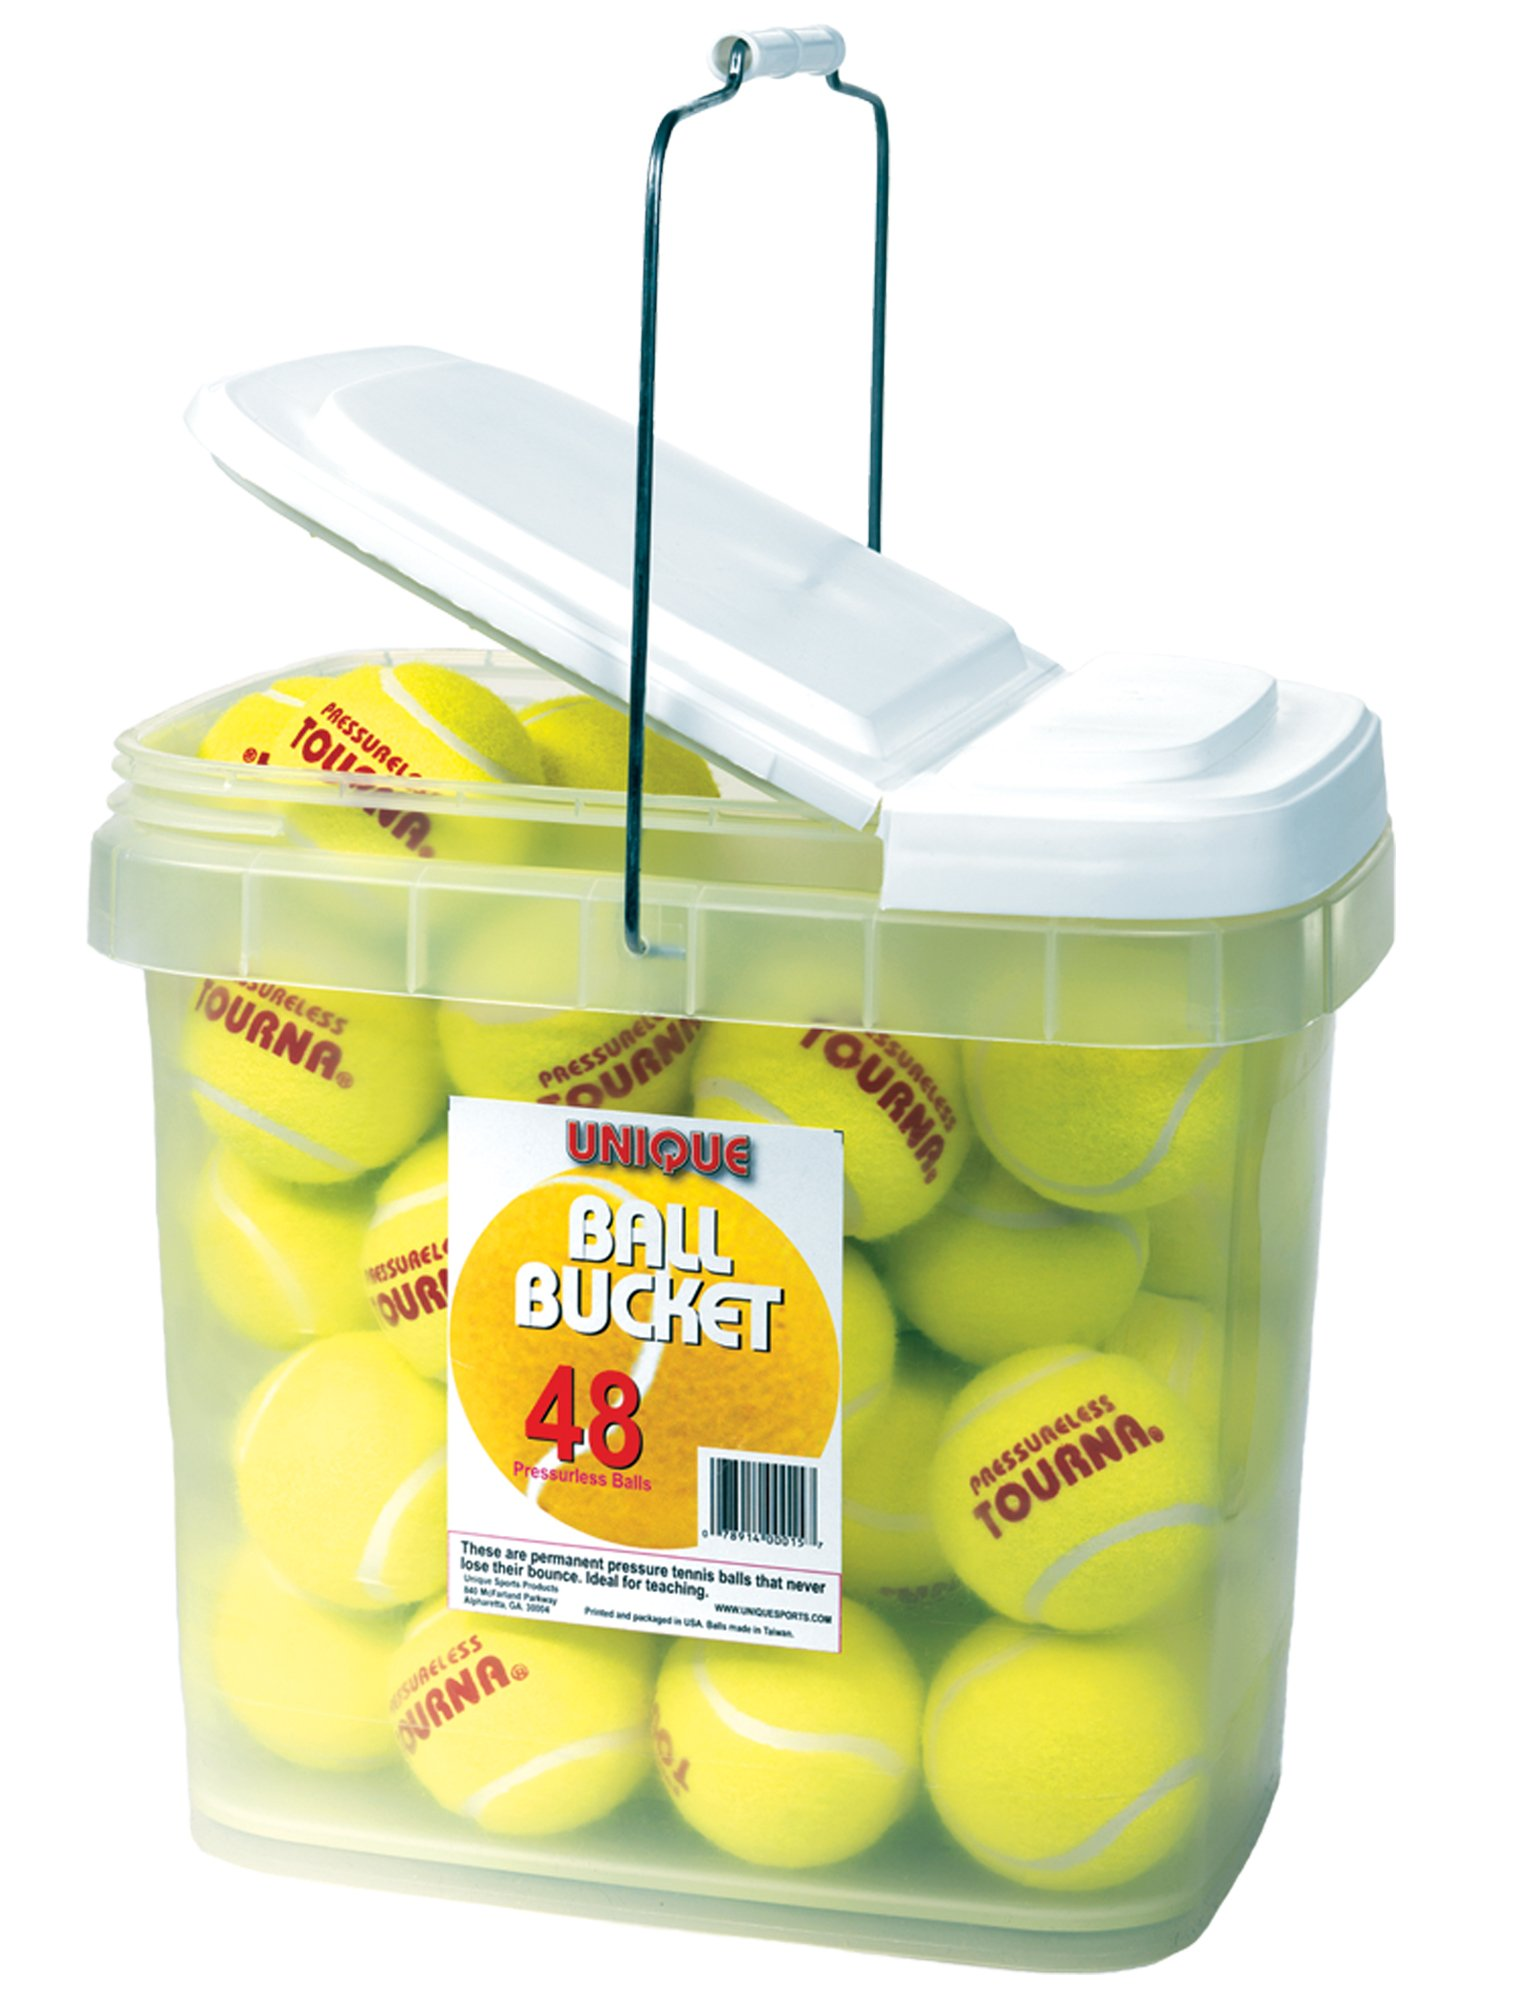 Unique Tourna Bucket of 48 Pressureless Tennis Balls